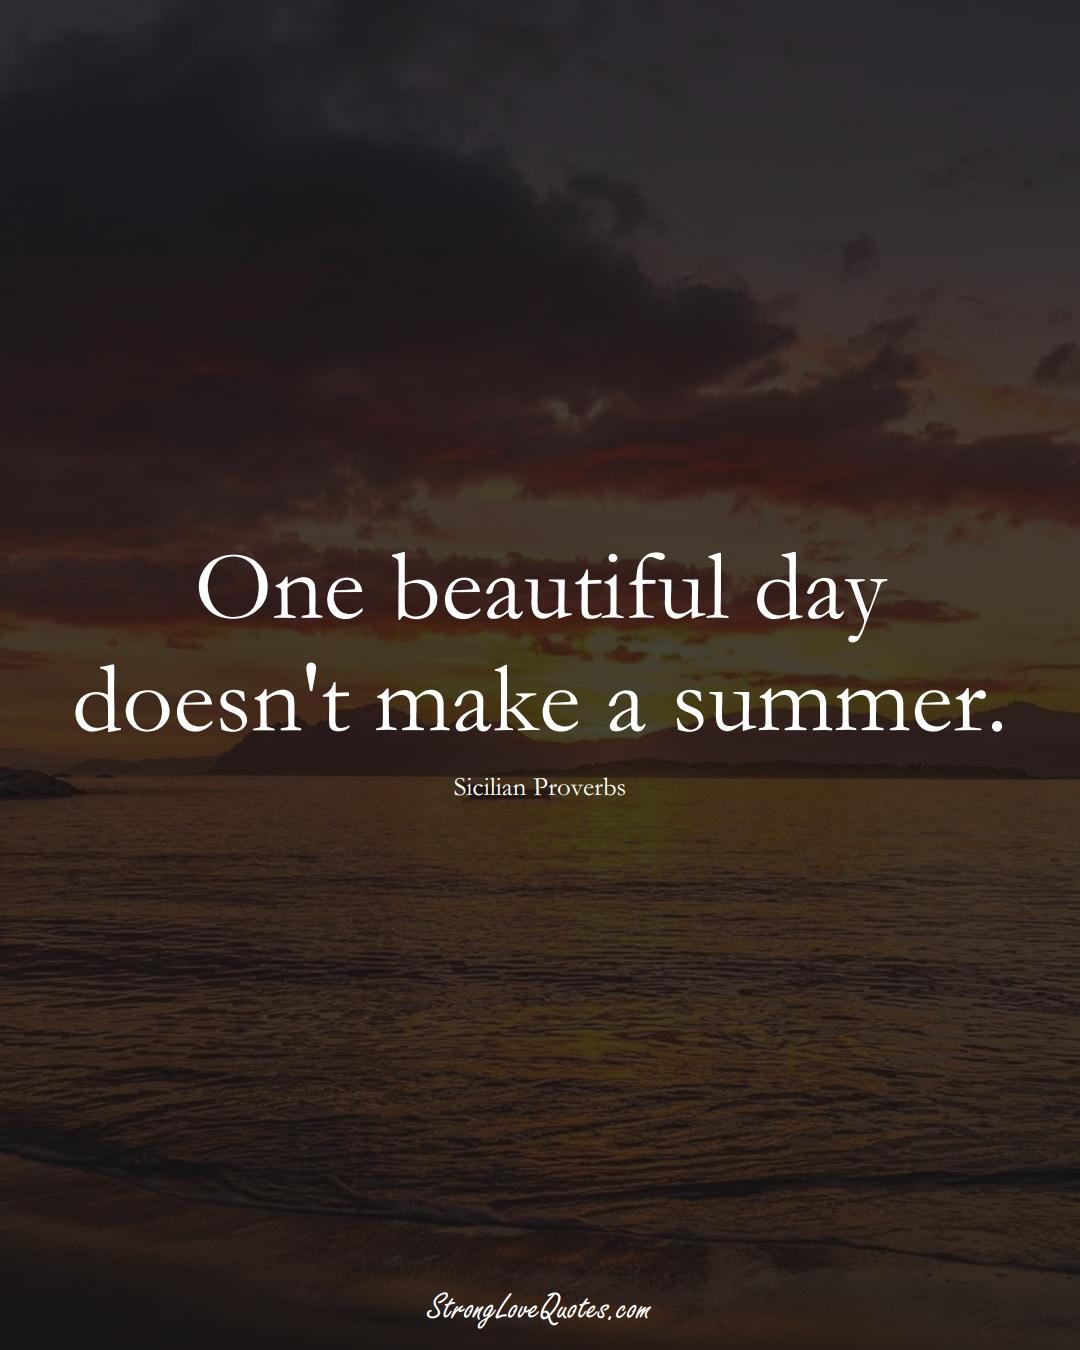 One beautiful day doesn't make a summer. (Sicilian Sayings);  #EuropeanSayings